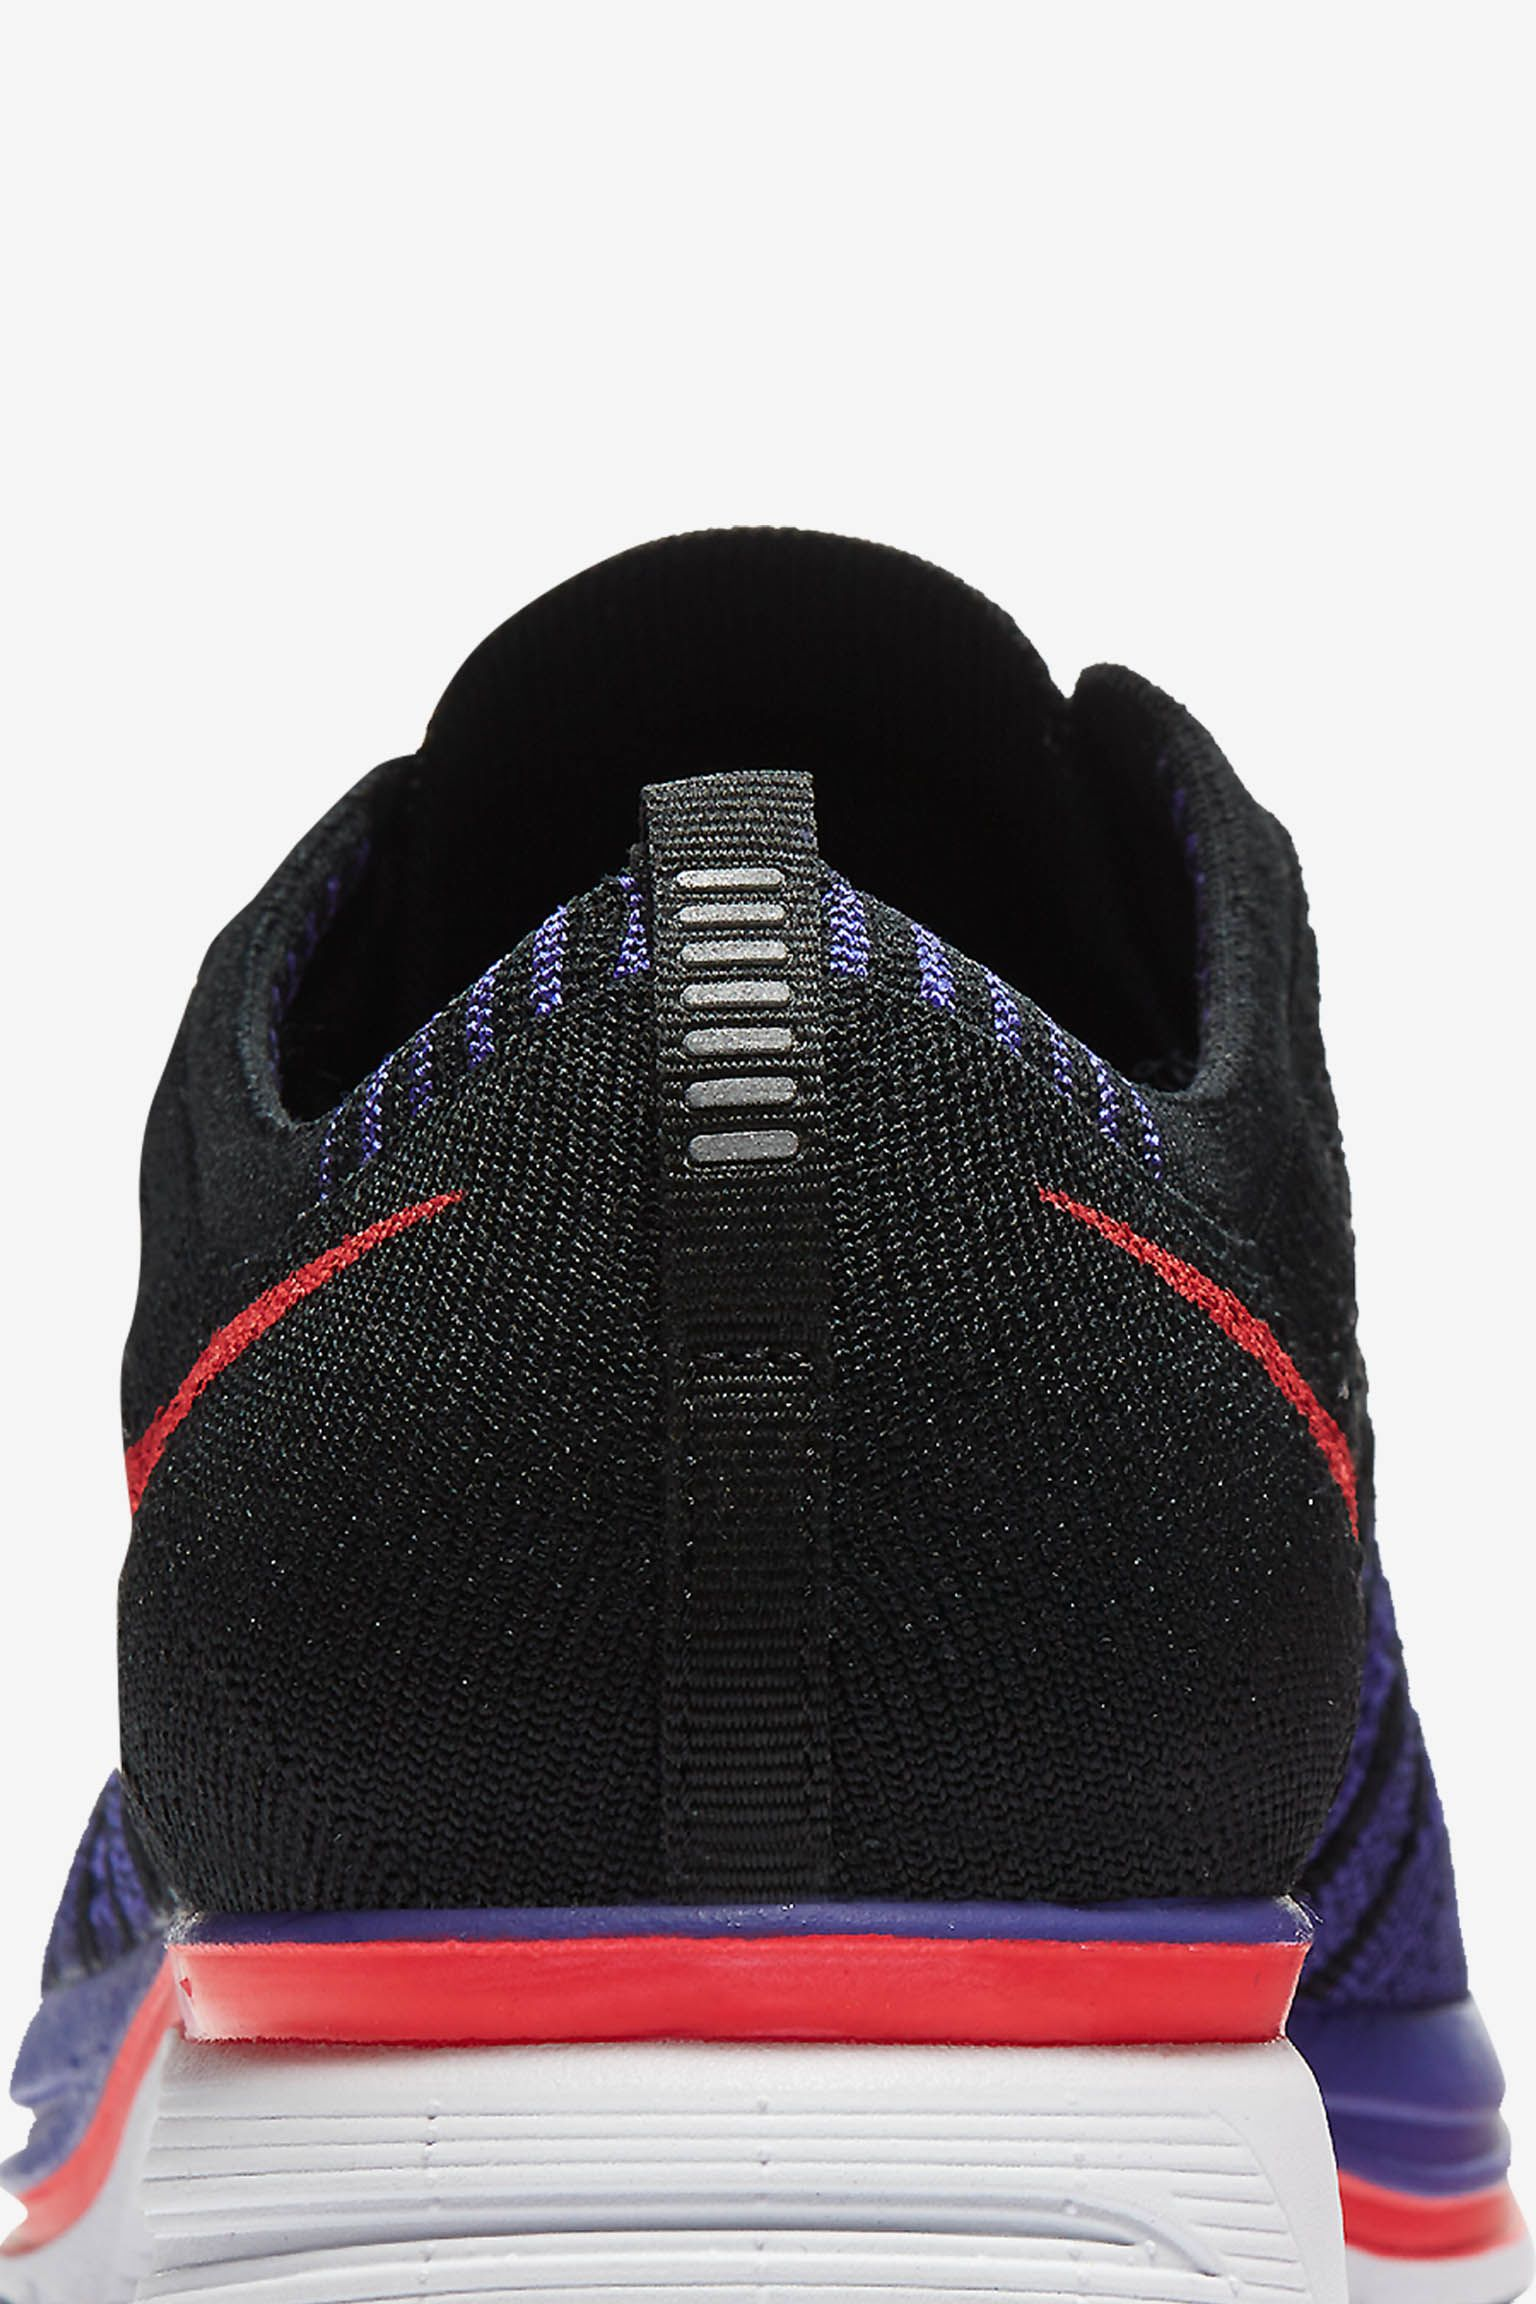 Nike Flyknit Trainer 'Siren Red & Persian Violet' Release Date